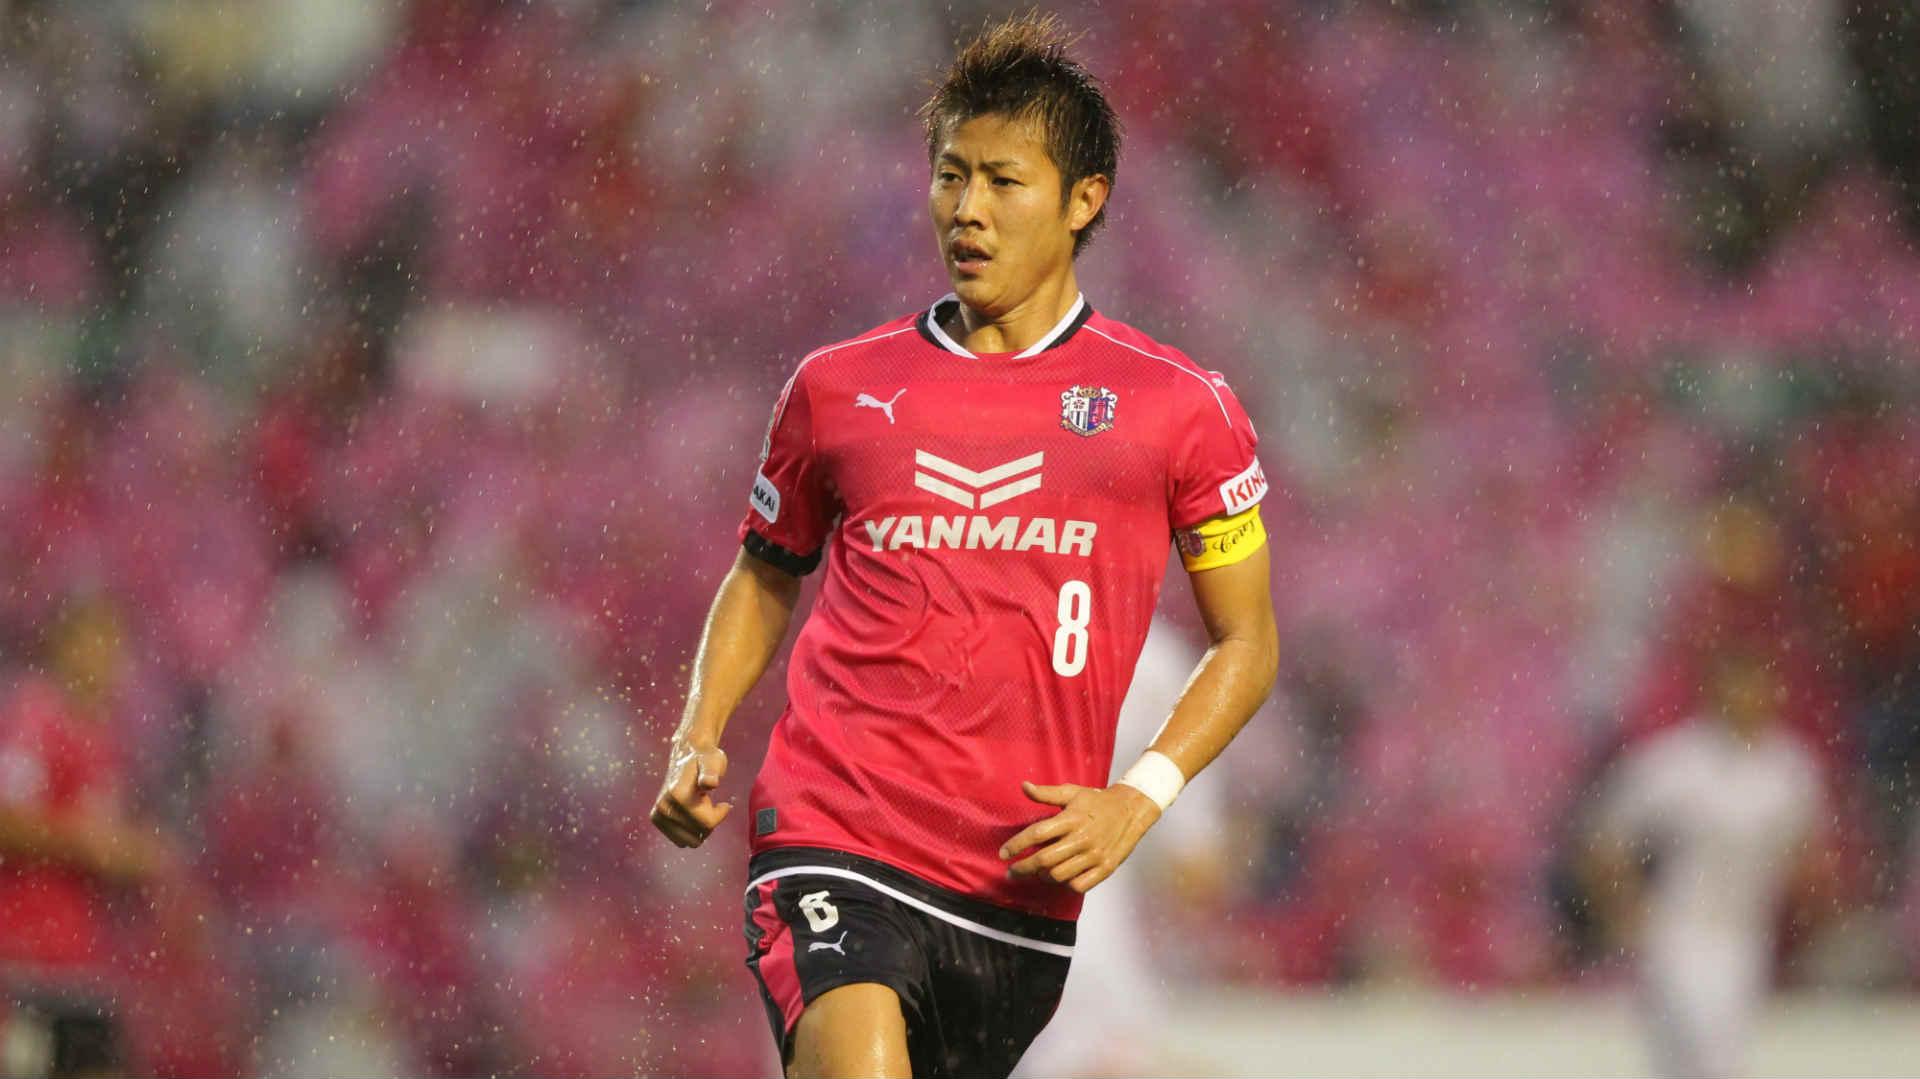 http://images.performgroup.com/di/library/Goal_Thailand/b1/ac/yoichiro-kakitani_u2ncgxo0nqs1kjiue294z9ug.jpg?t=-856189416&w=620&h=430